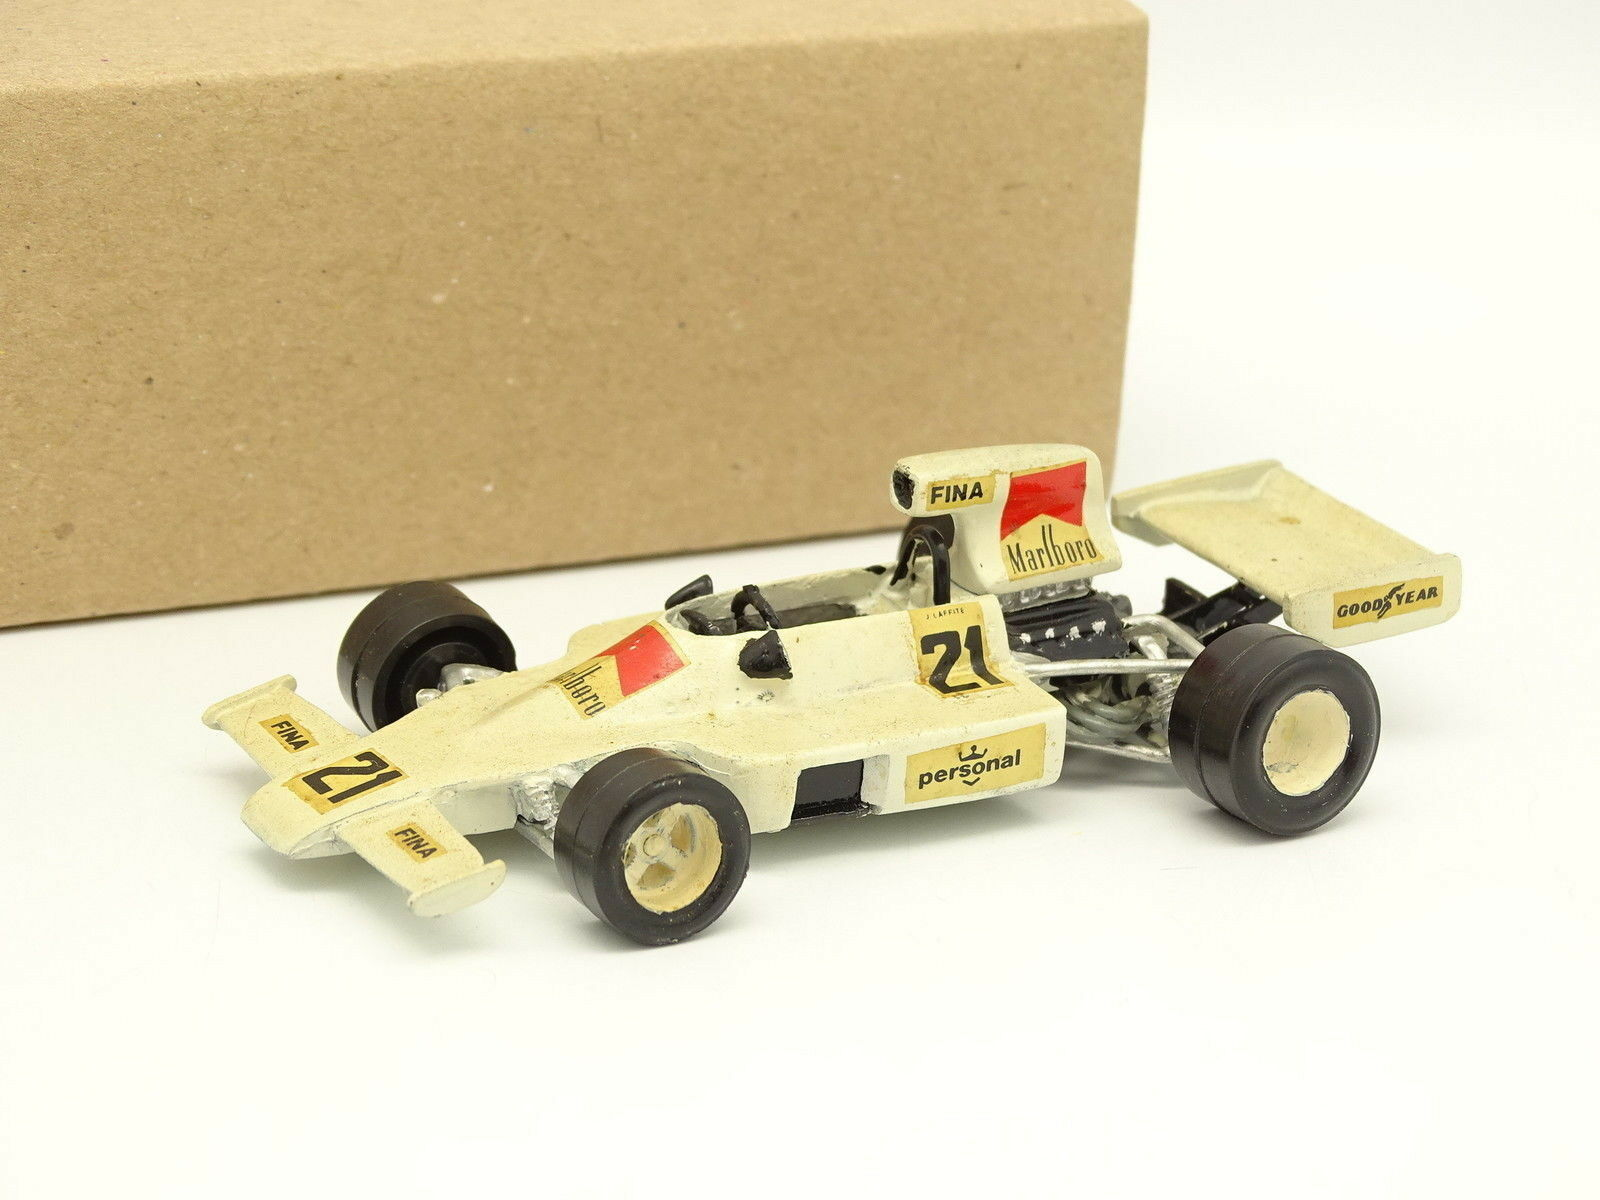 John Day Kit Métal Monté 1 43 - F1 F1 F1 Williams FW02 - GP de Brasil 1975 Laffite 94d3c0